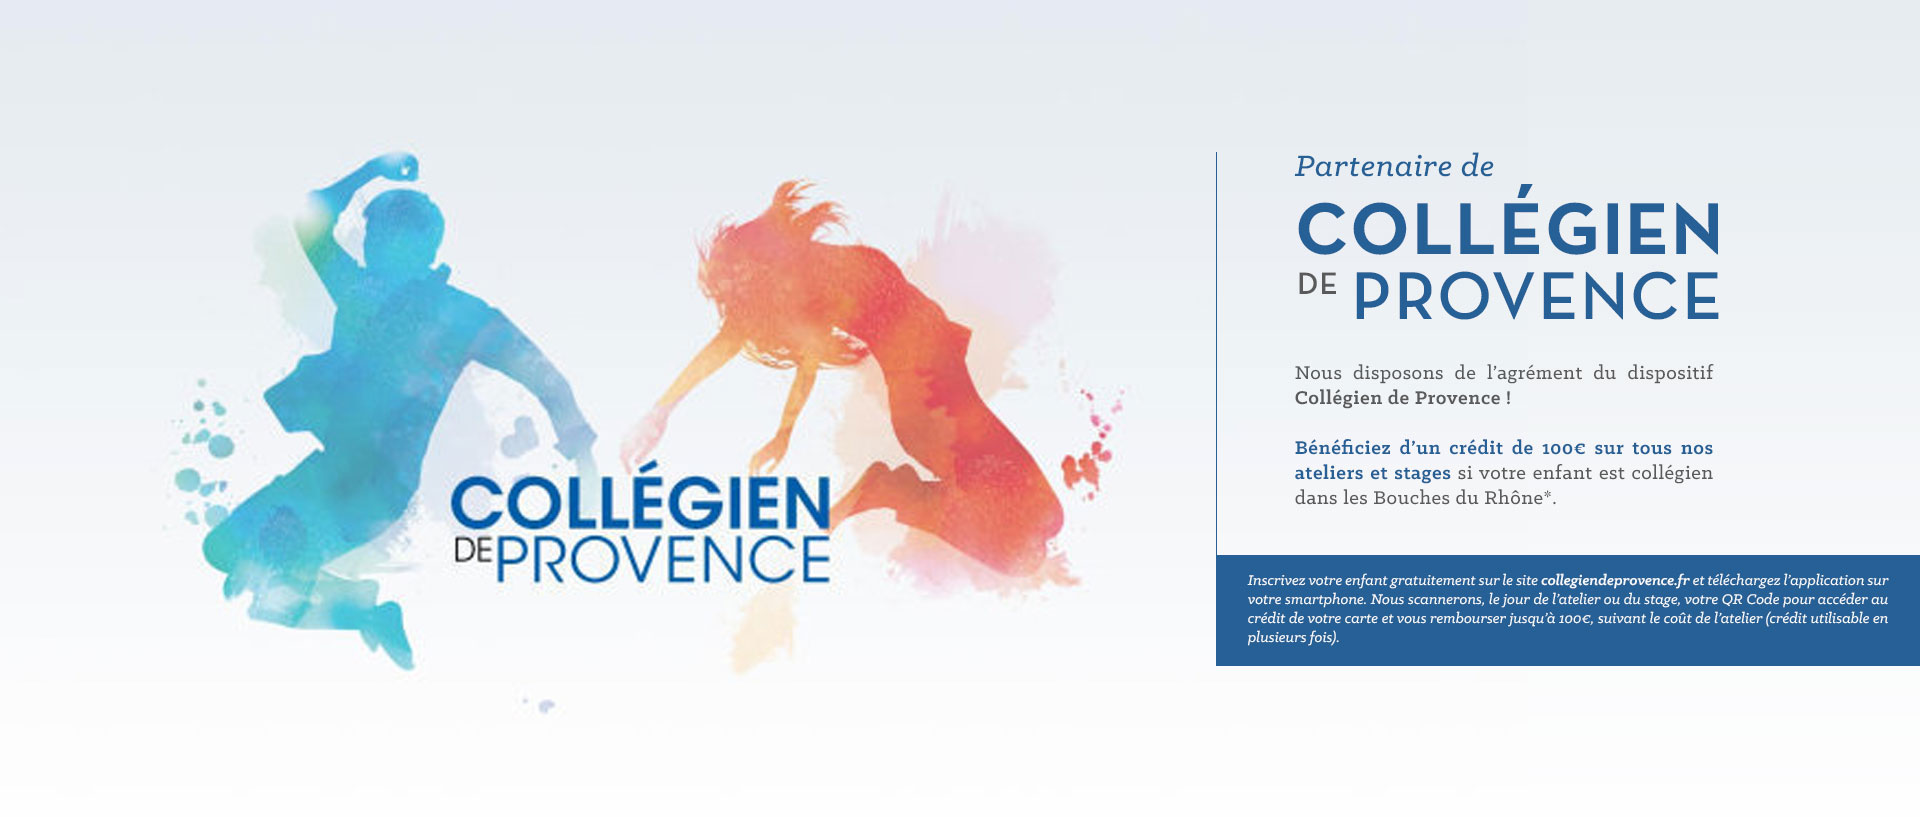 collegien Provence